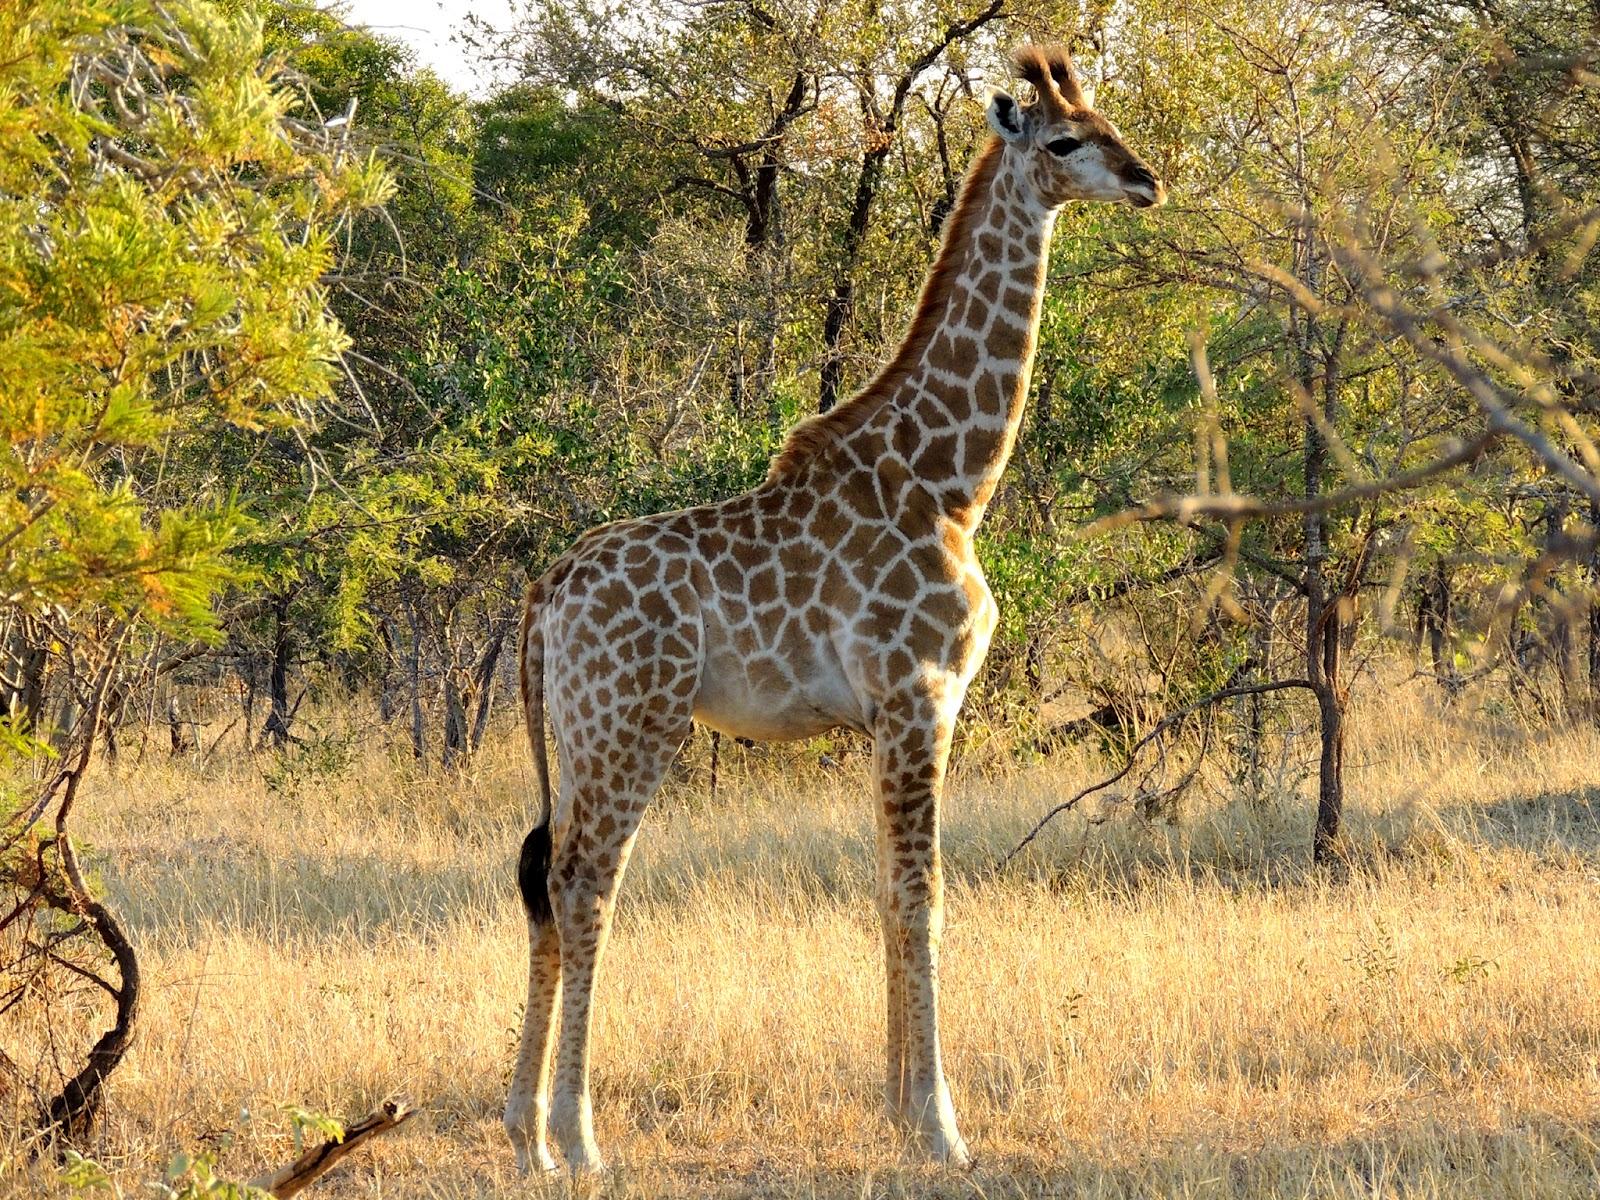 Tintswalo Ranger's Blog: Bush Fact #2 - Giraffe